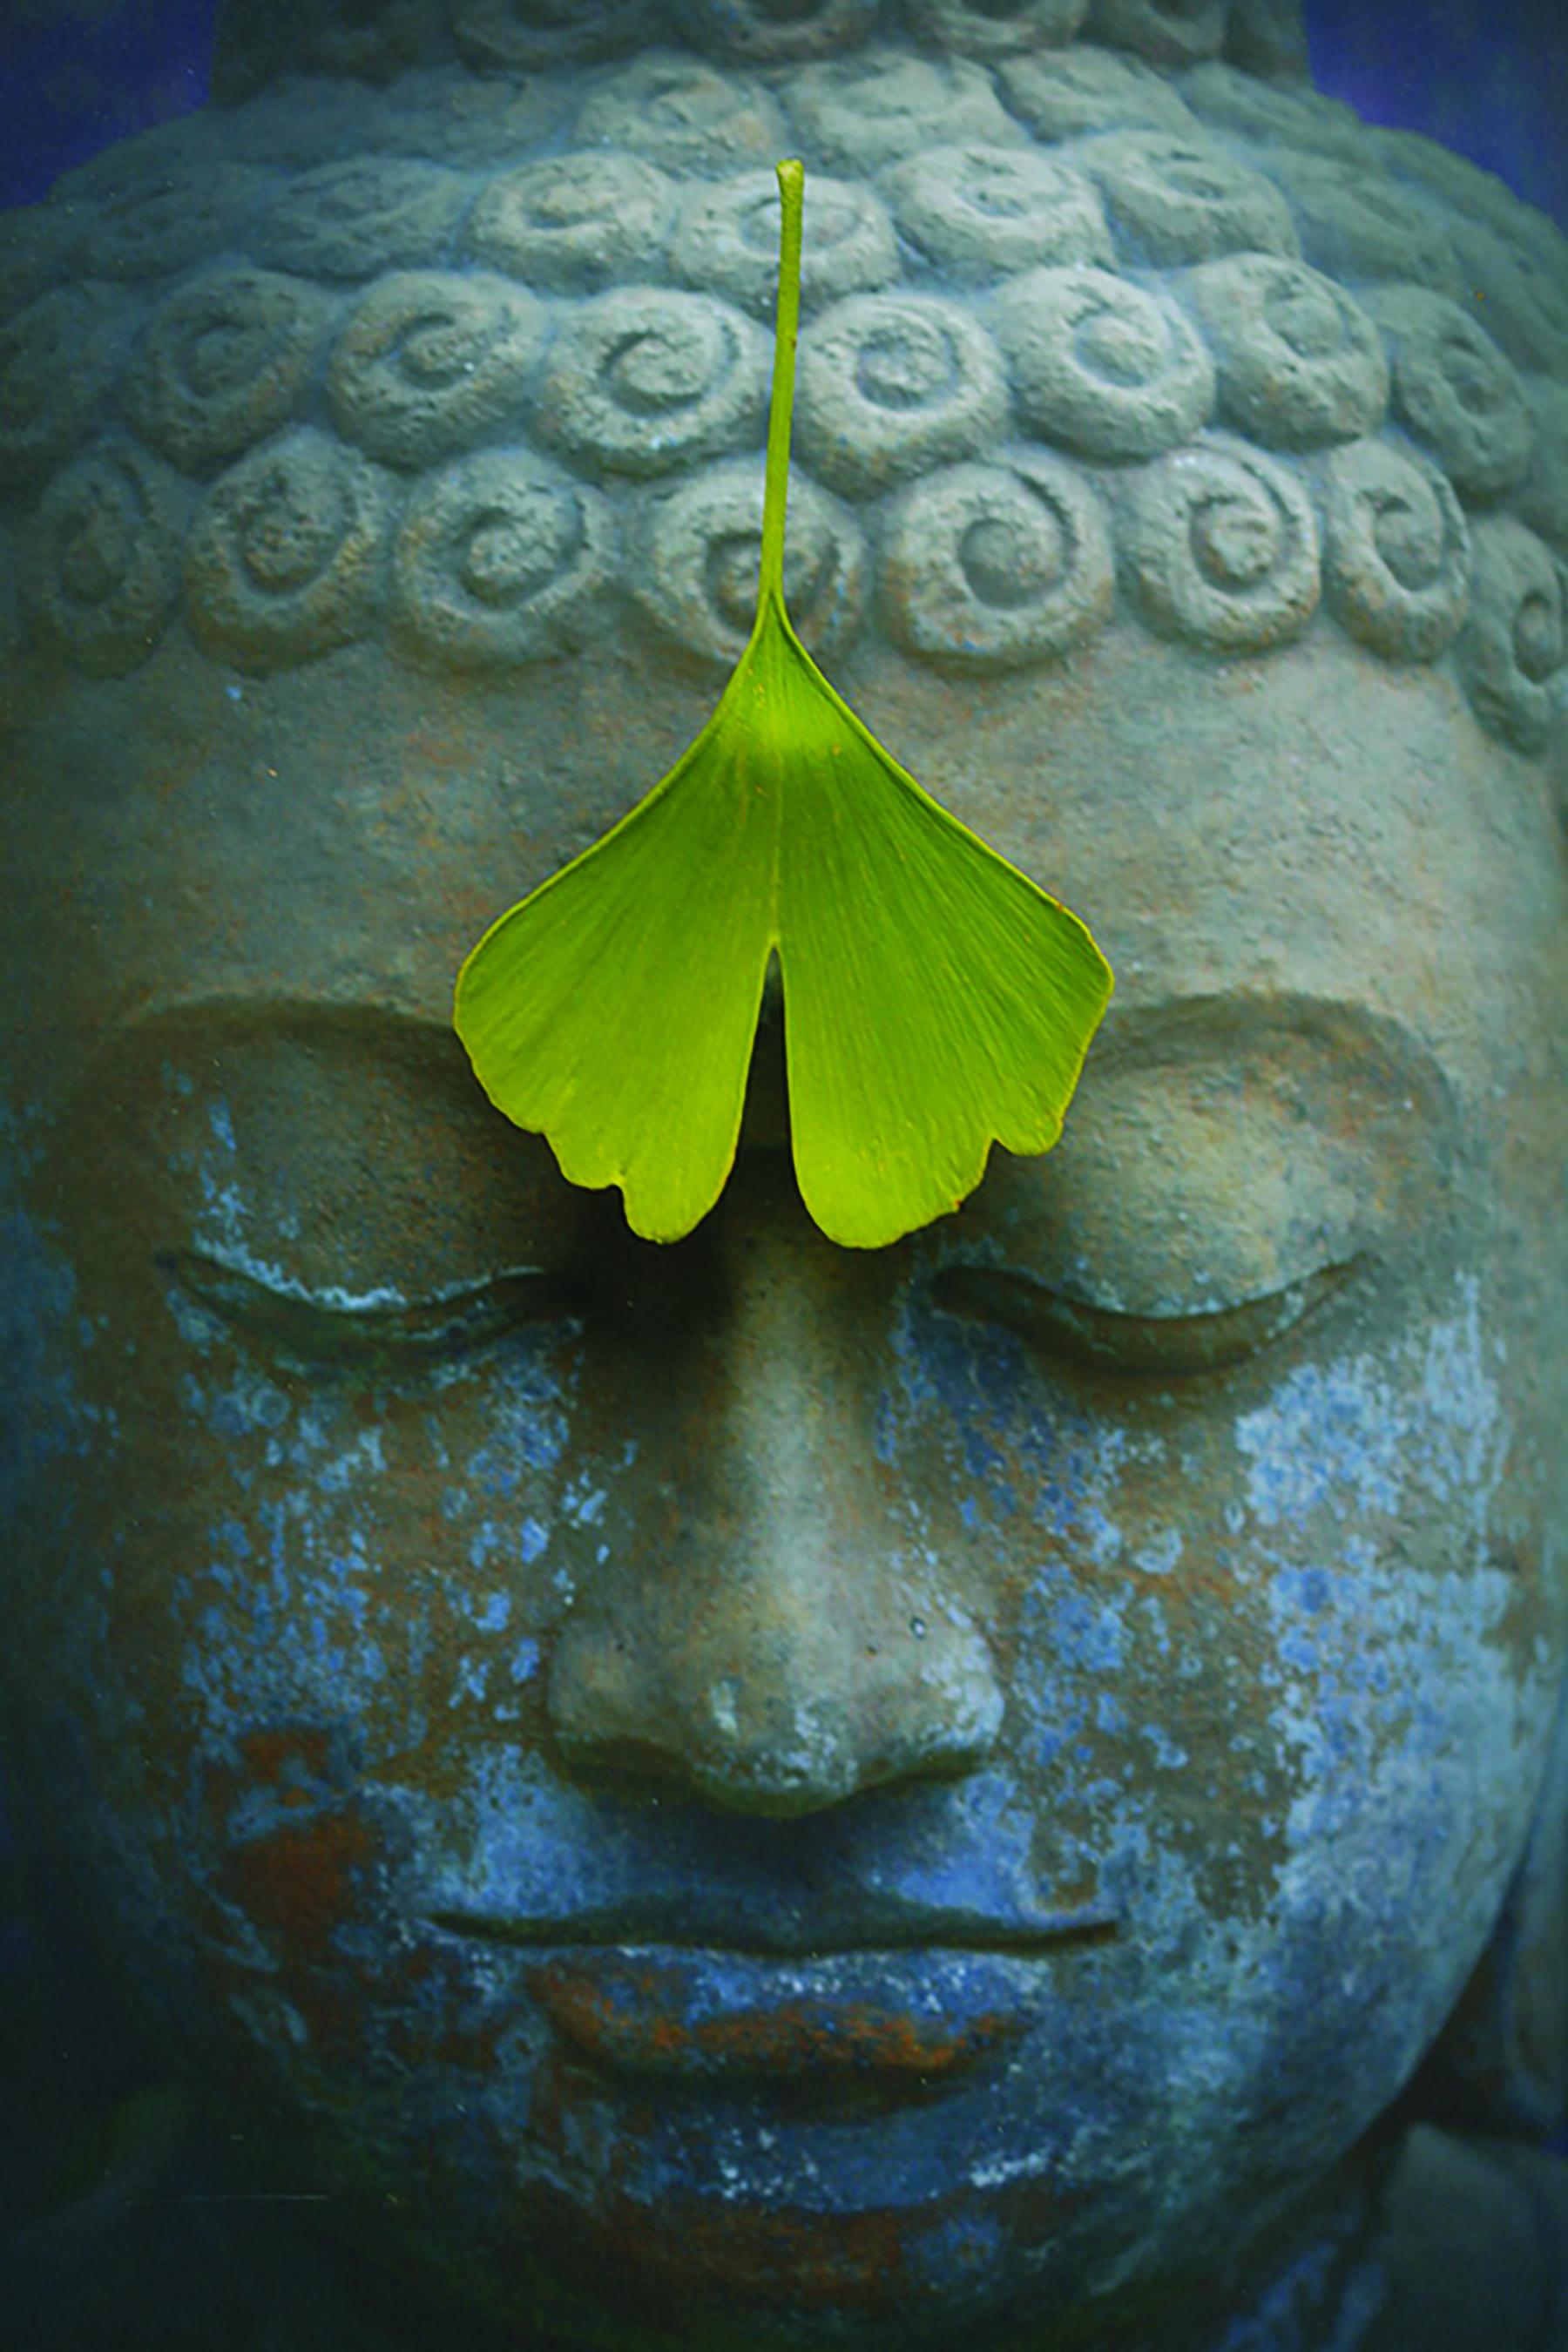 buddha-2728793_1920-header.jpg